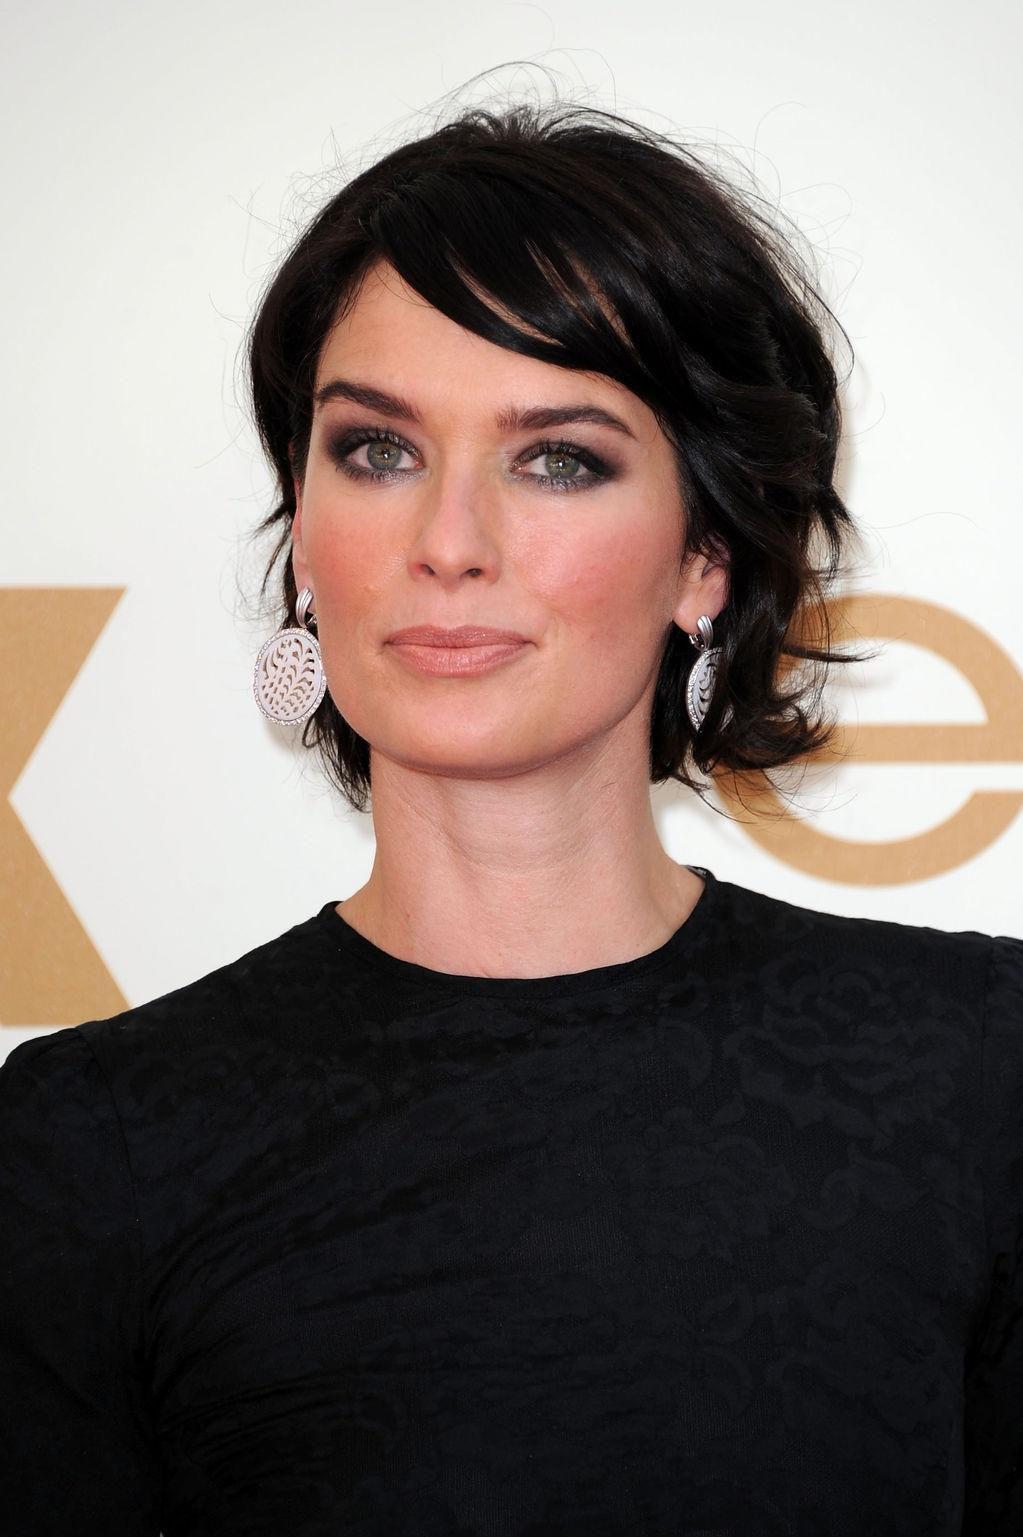 Photo of Lena Headey: English actress